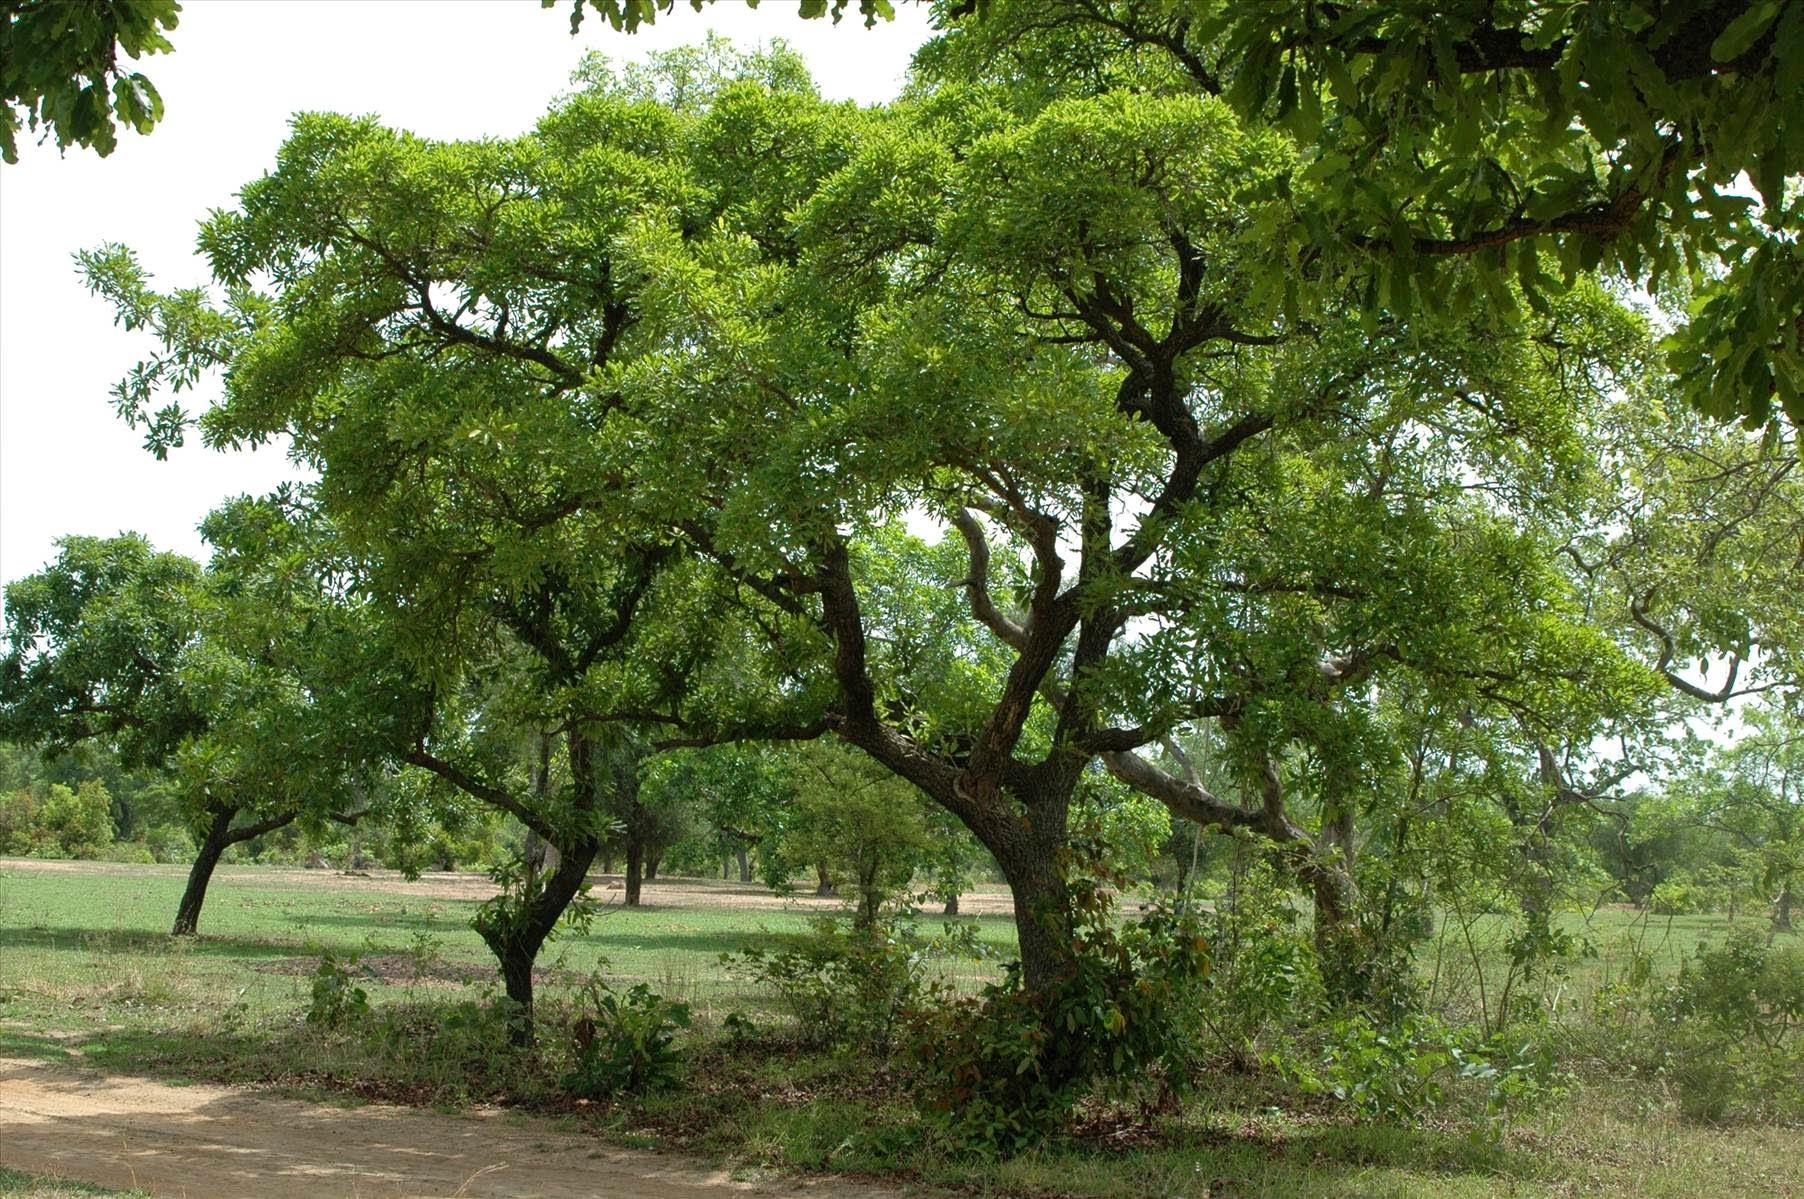 Sheabutterbaum in Ghana